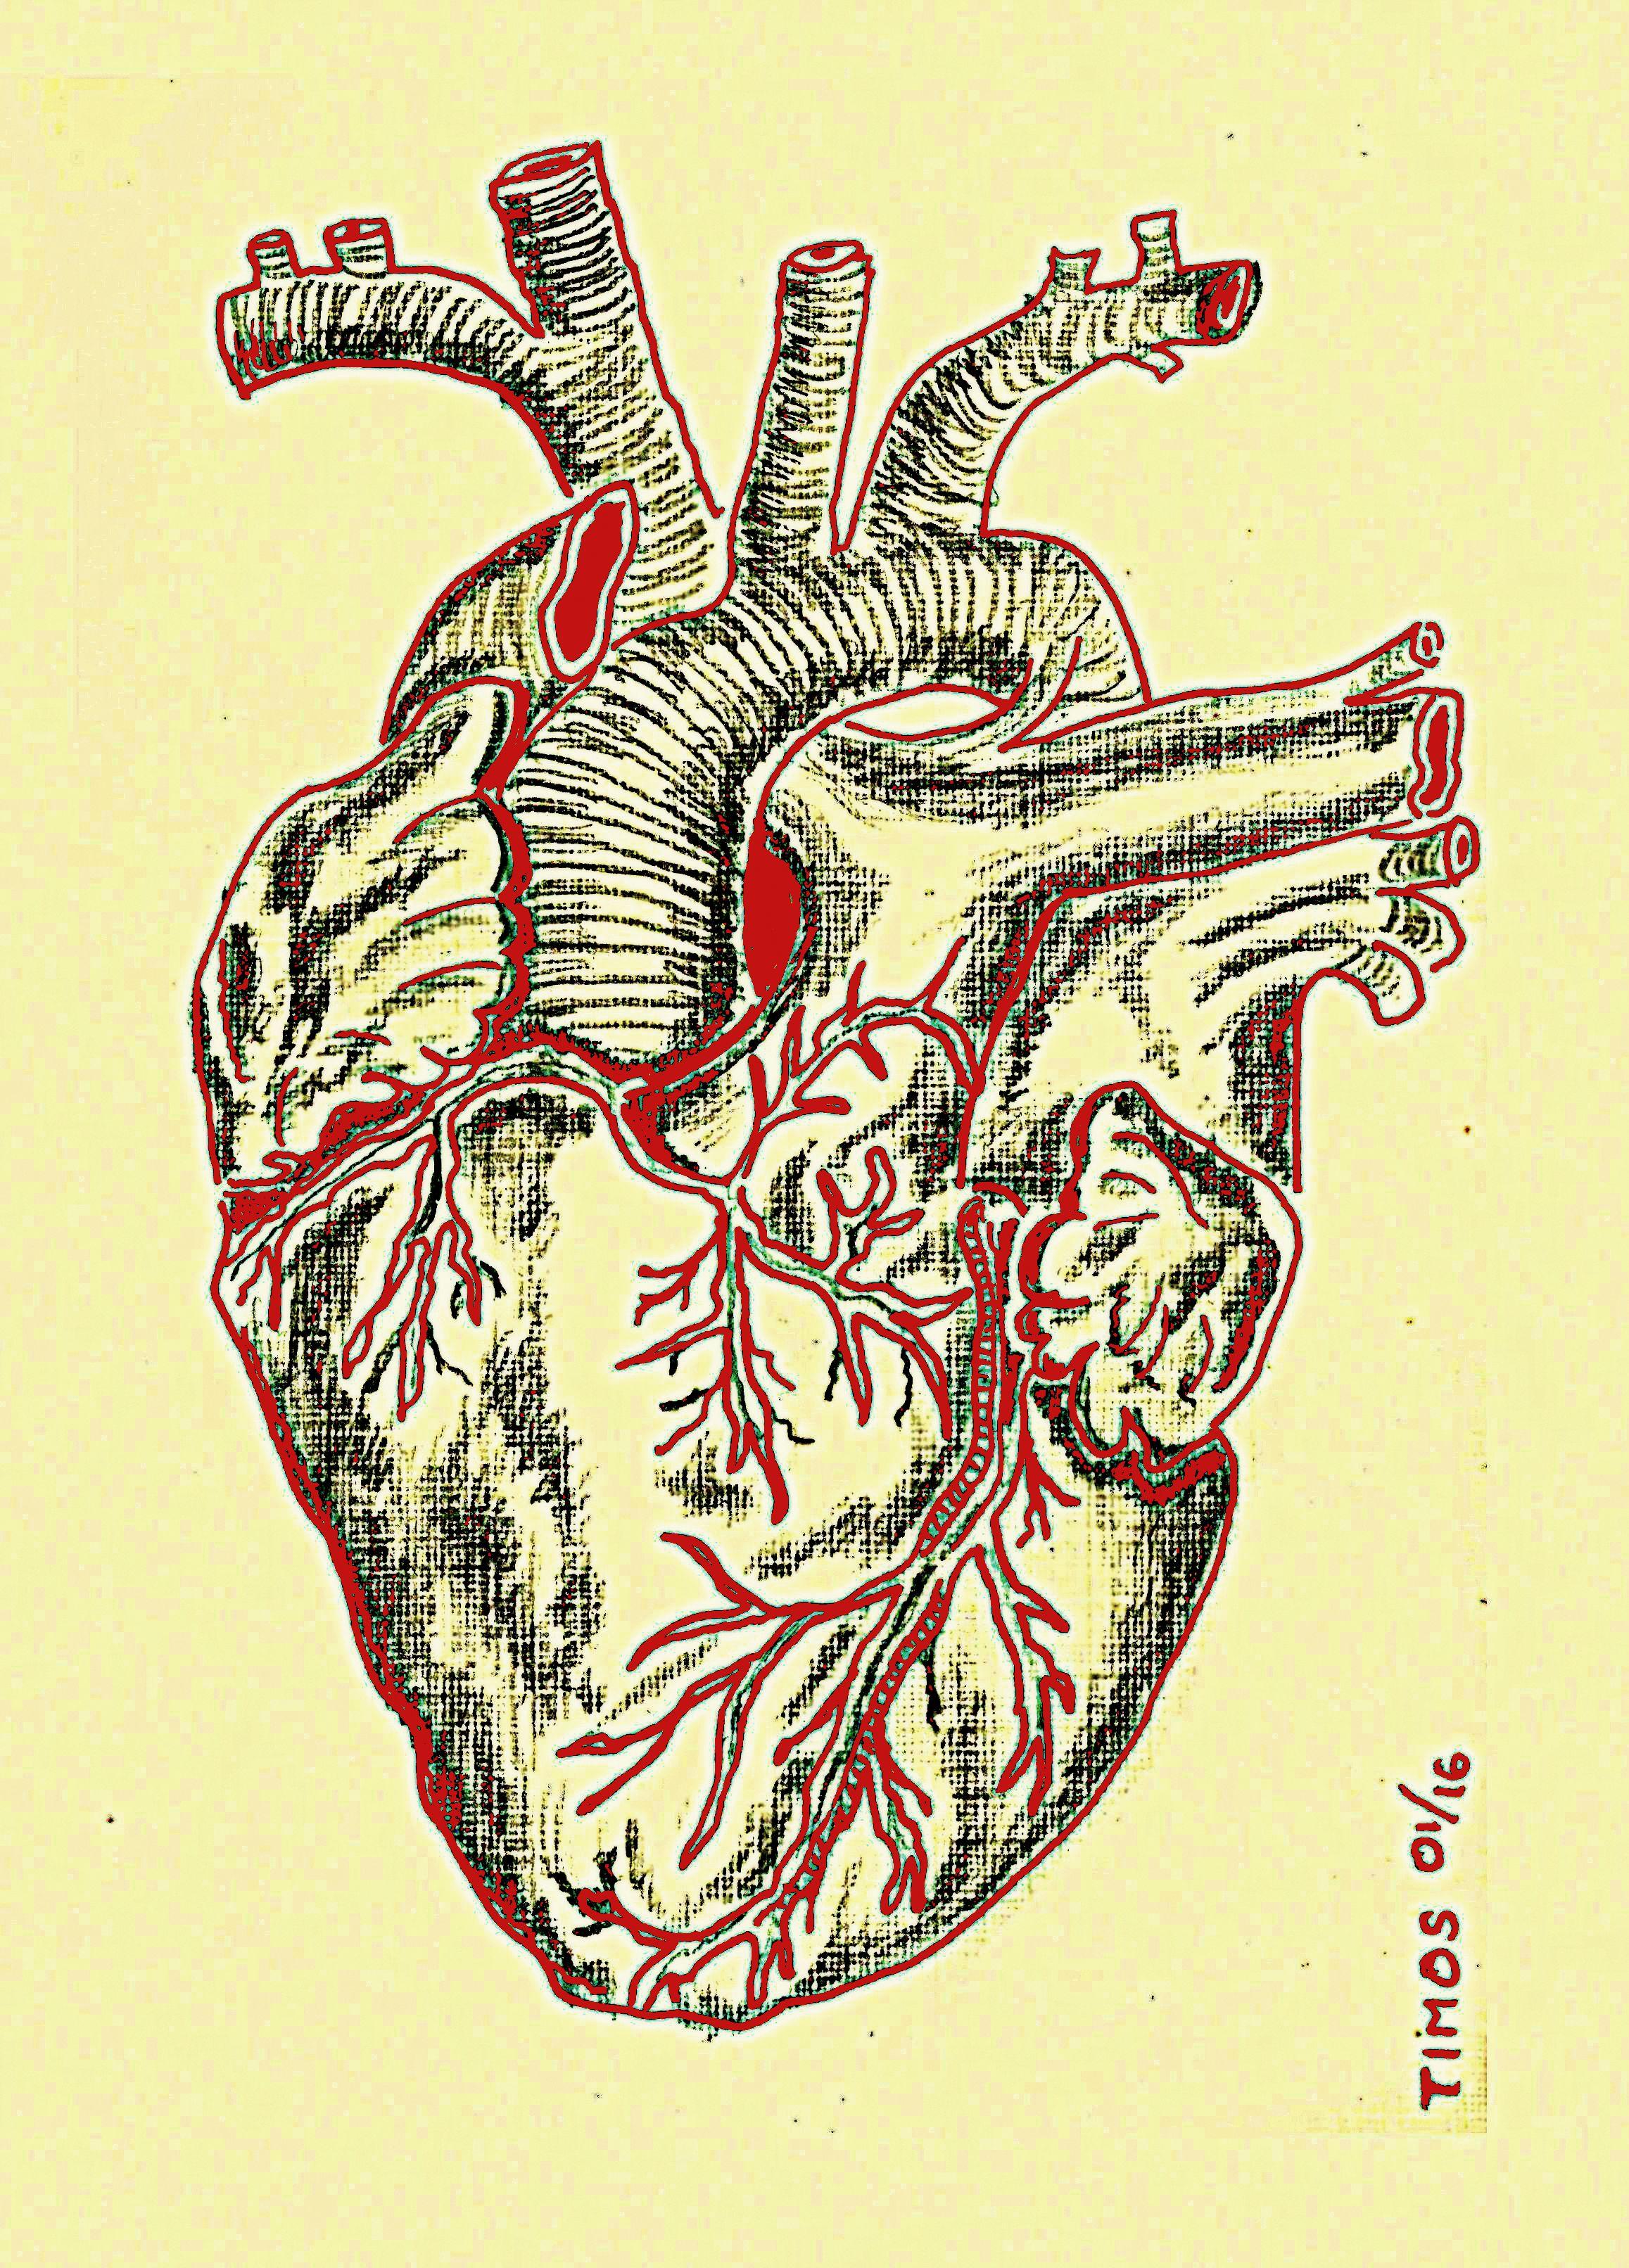 Heart – anatomical